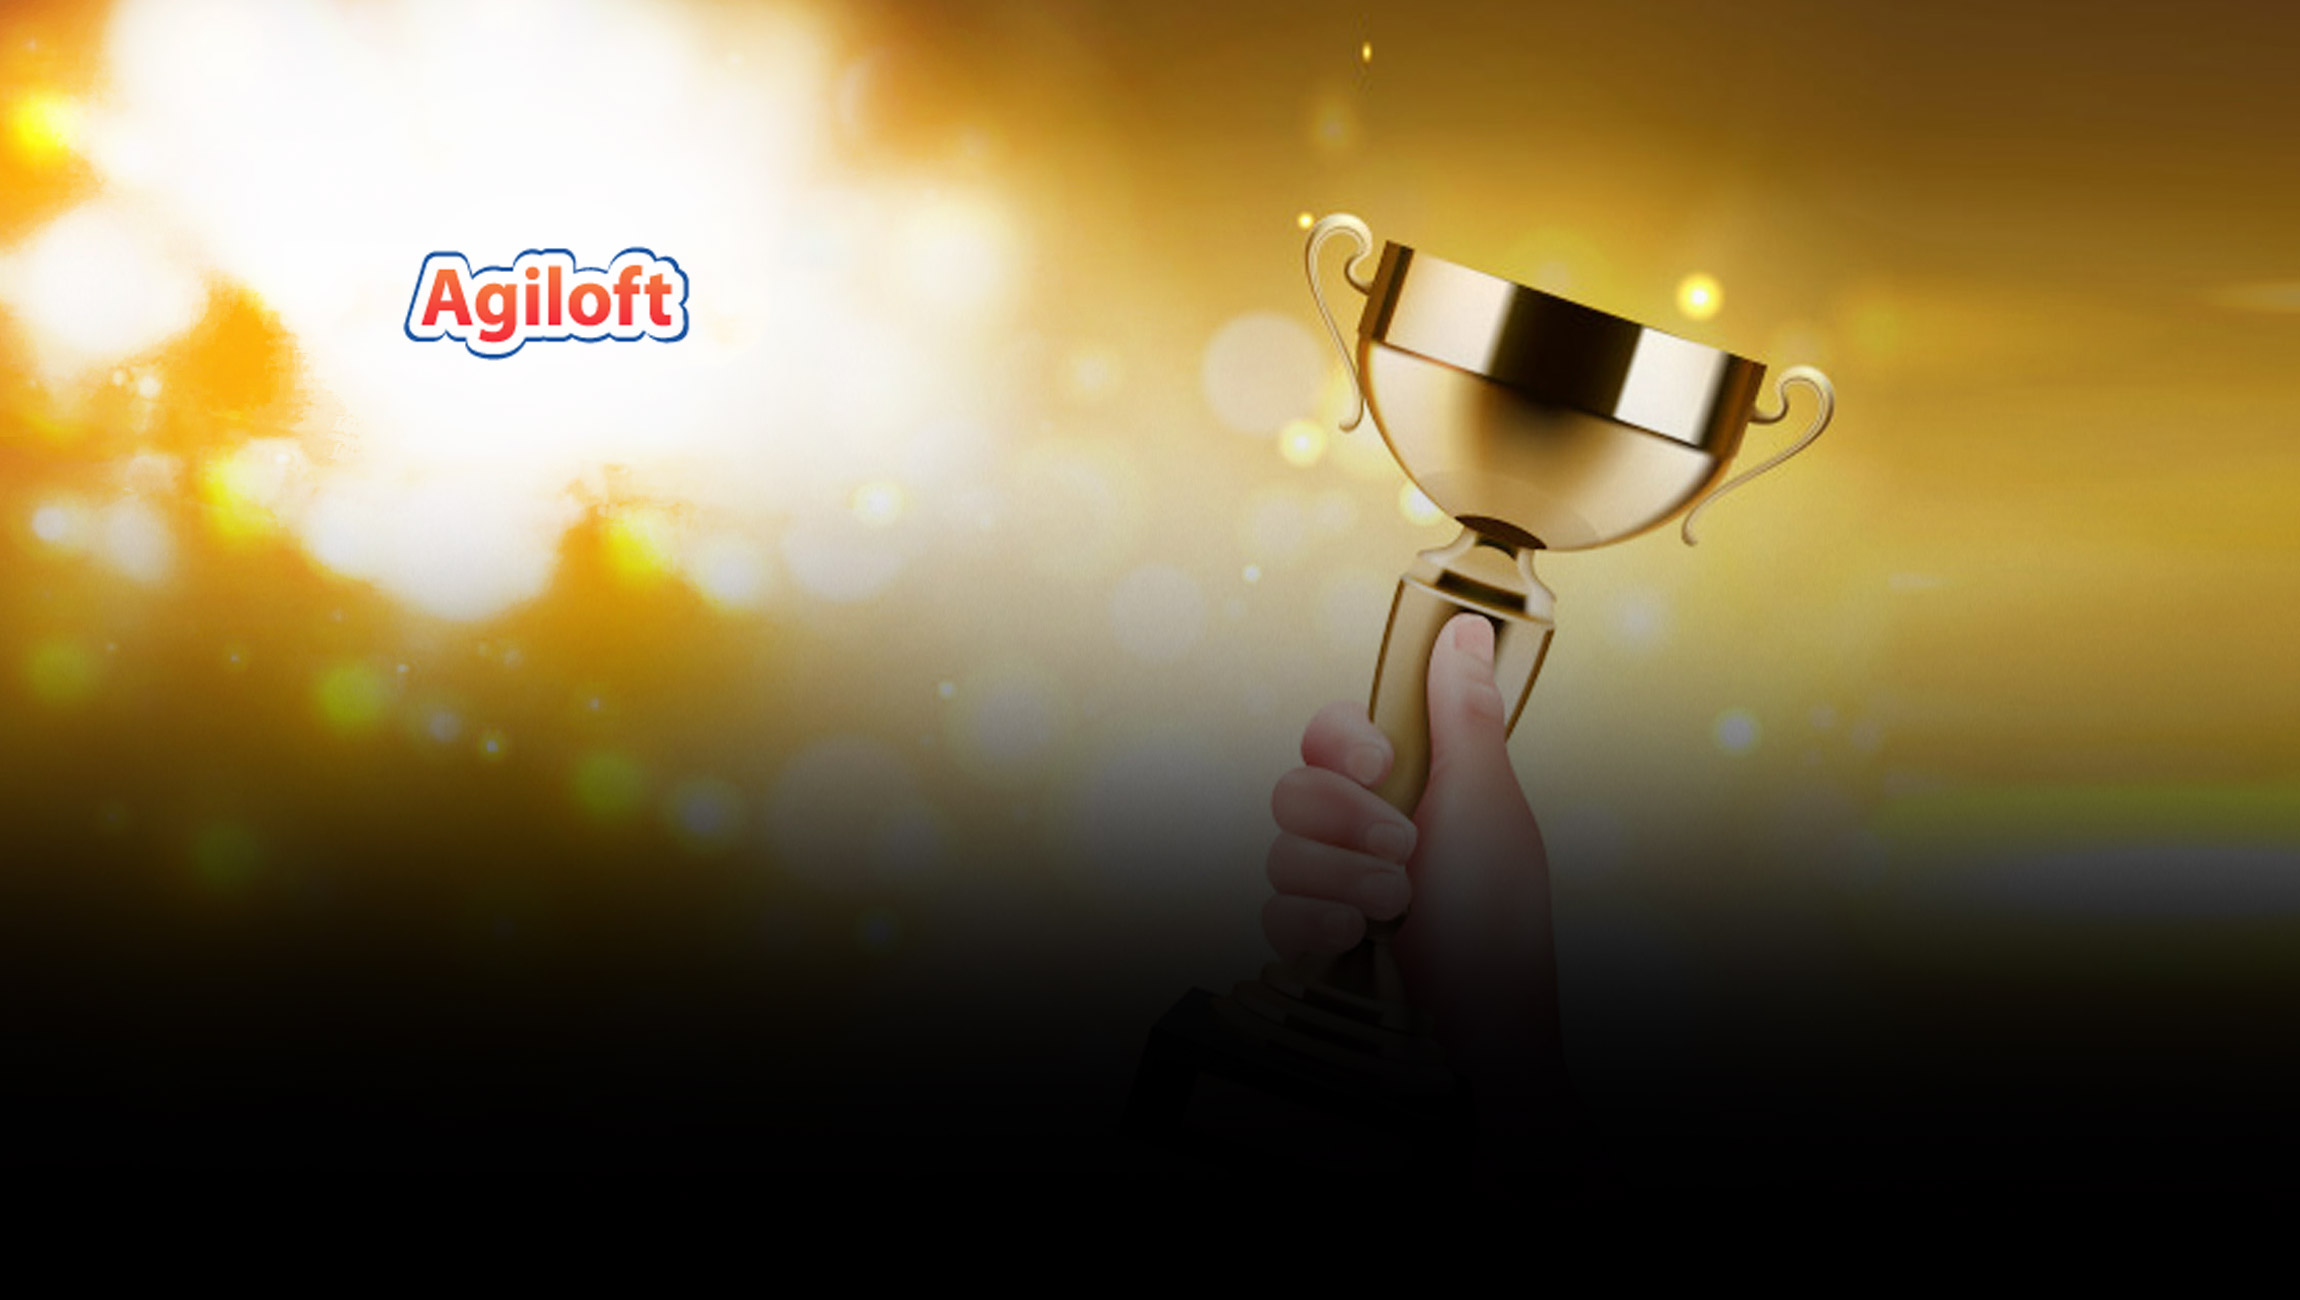 Agiloft Wins 2021 Business Intelligence Group Innovation Award for AI Core